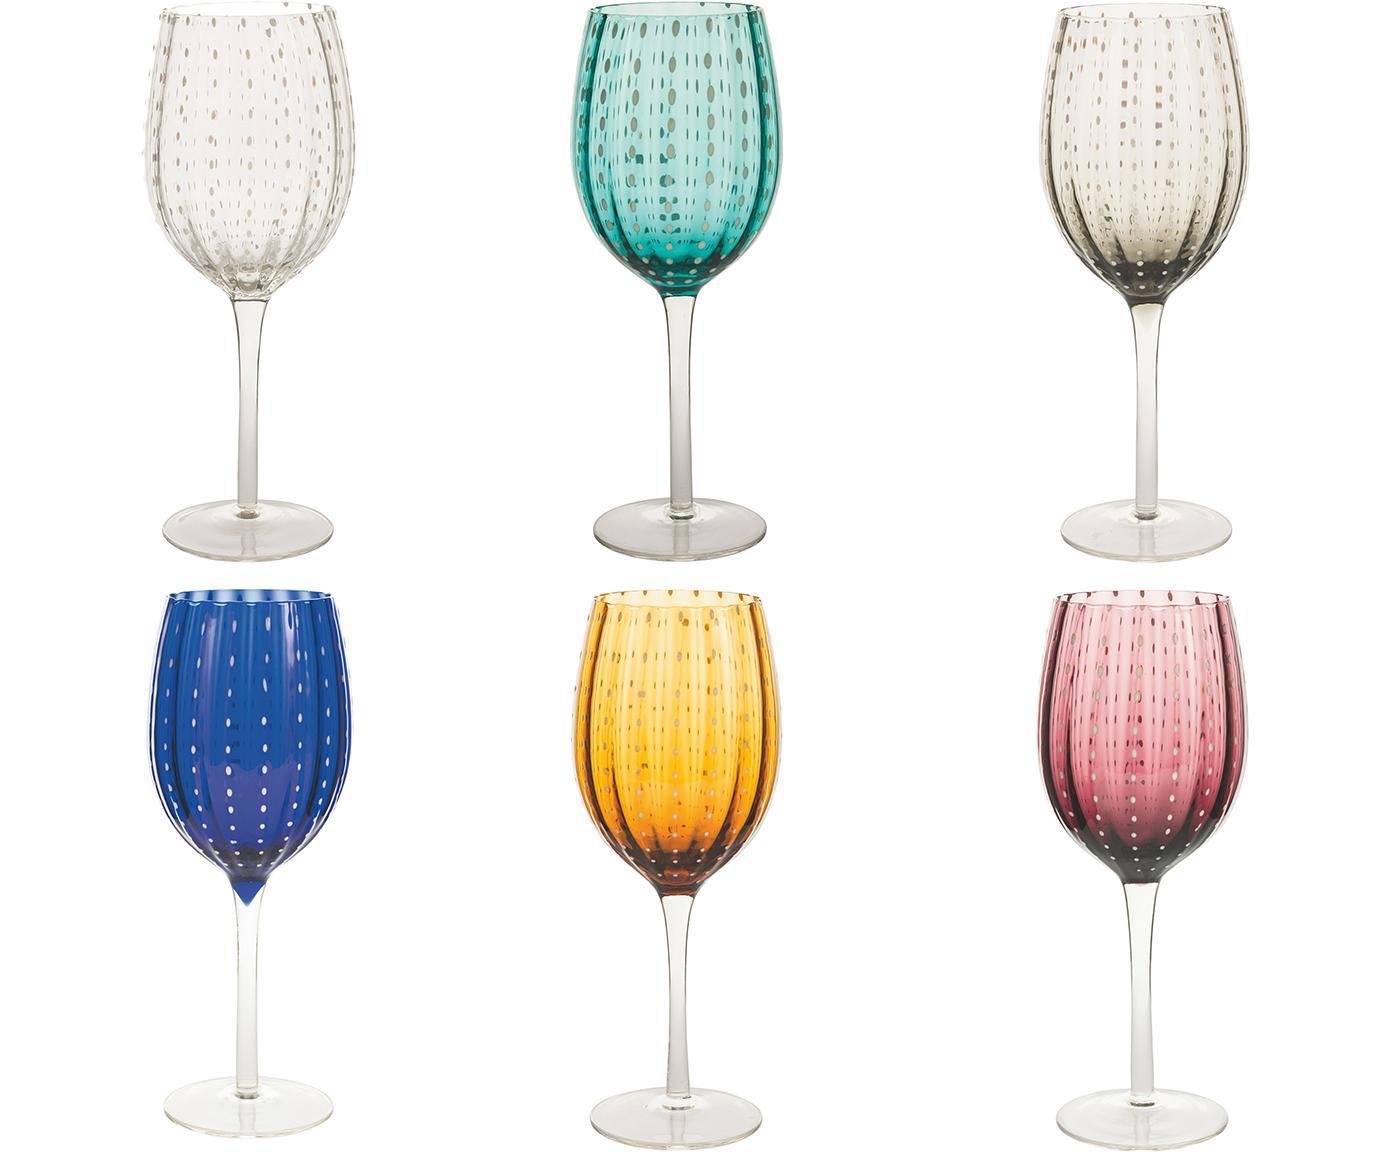 Wijnglazenset Shiraz, 6-delig, Glas, Multicolour, Ø 7 x H 23 cm